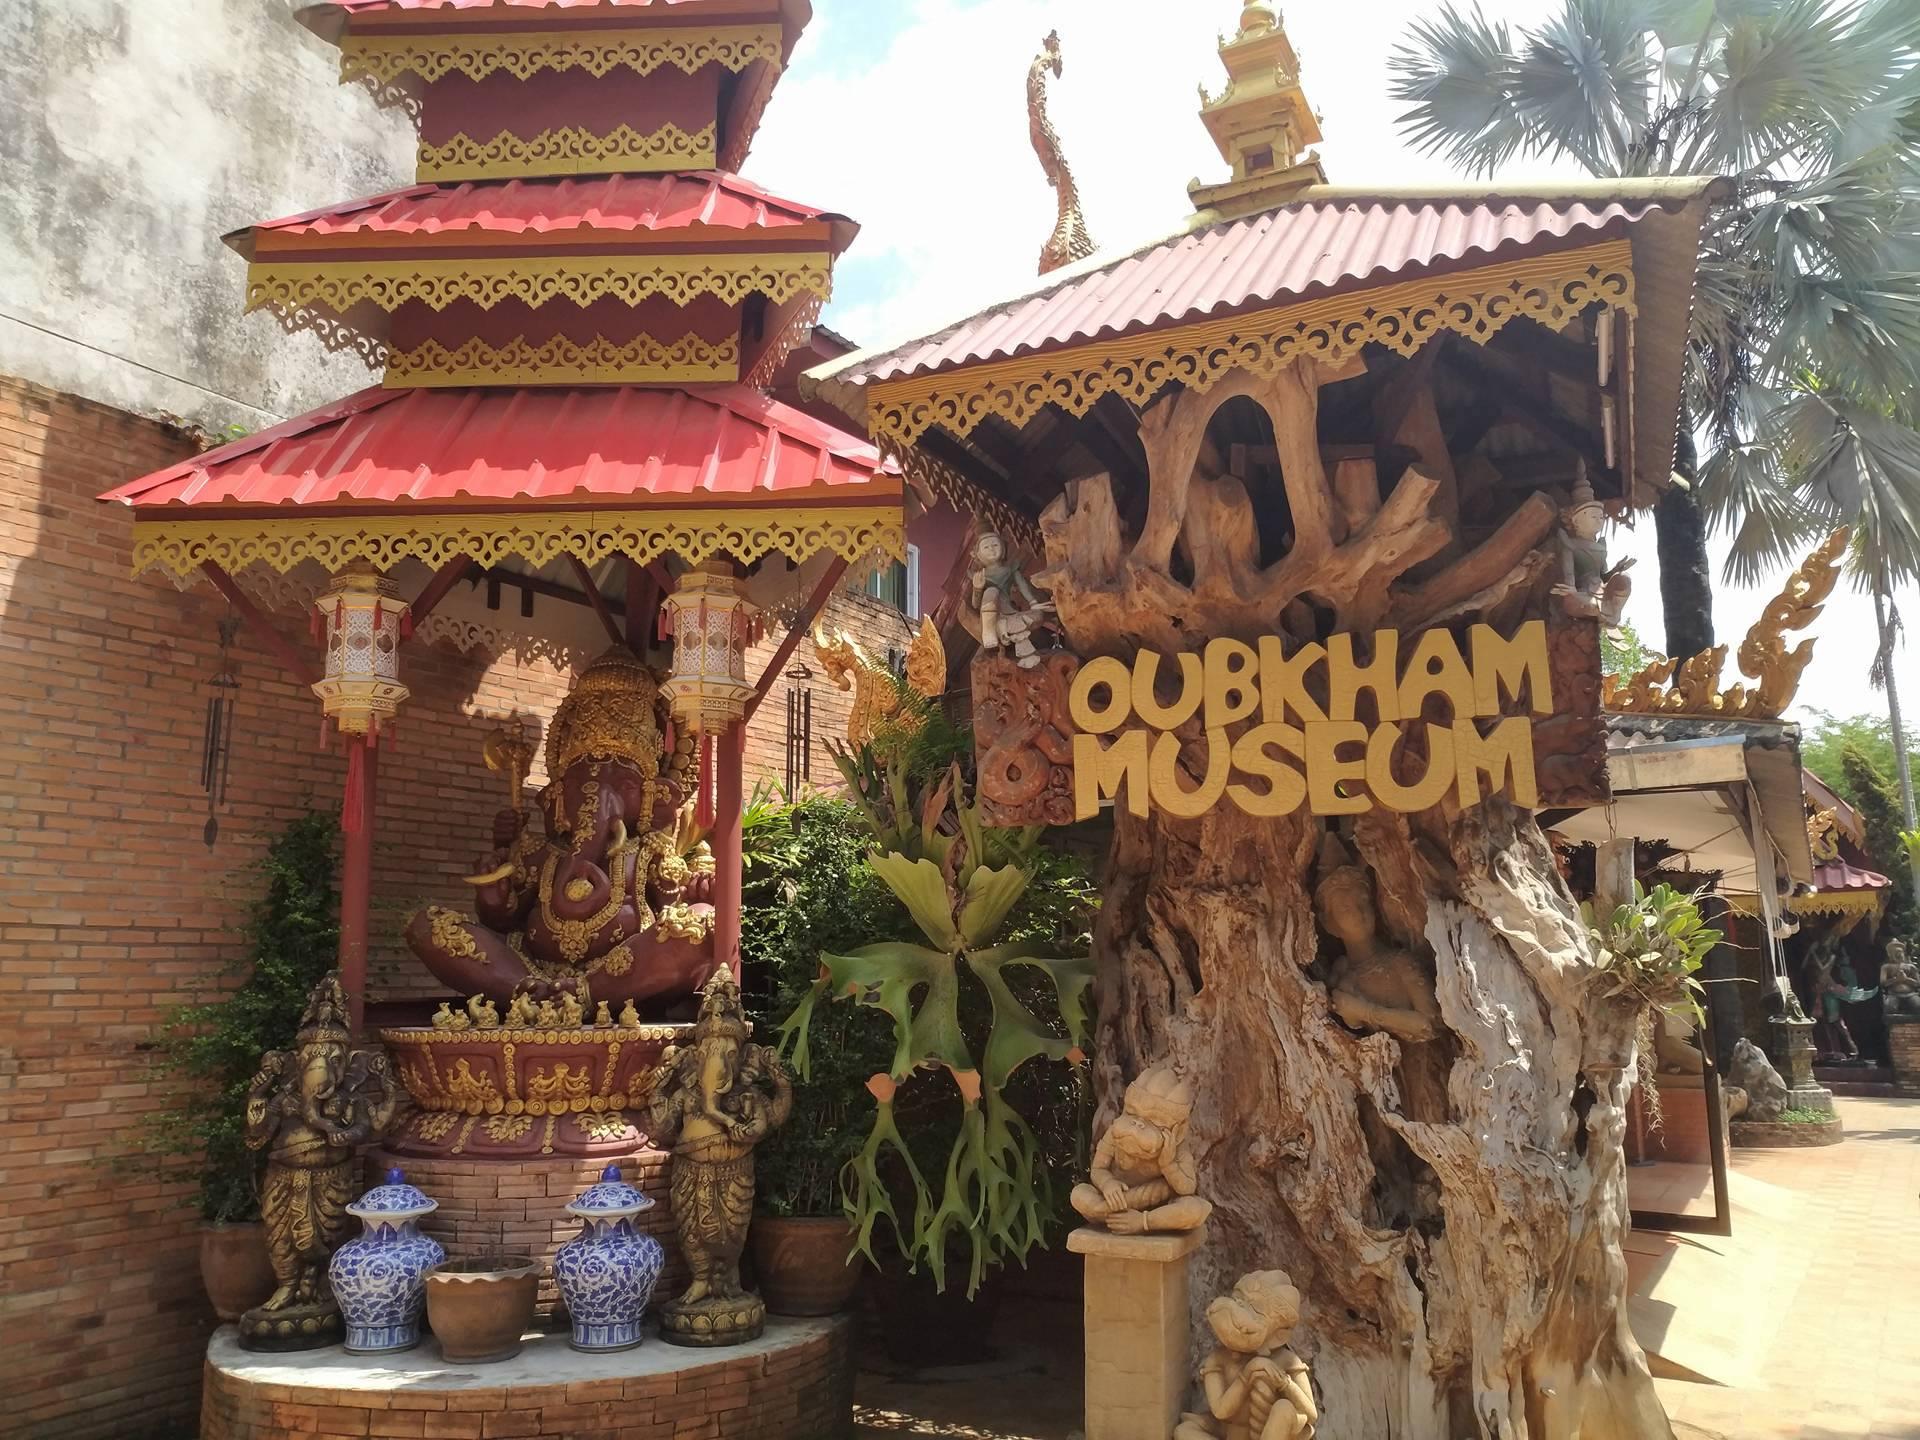 Bảo tàng Oub Kham